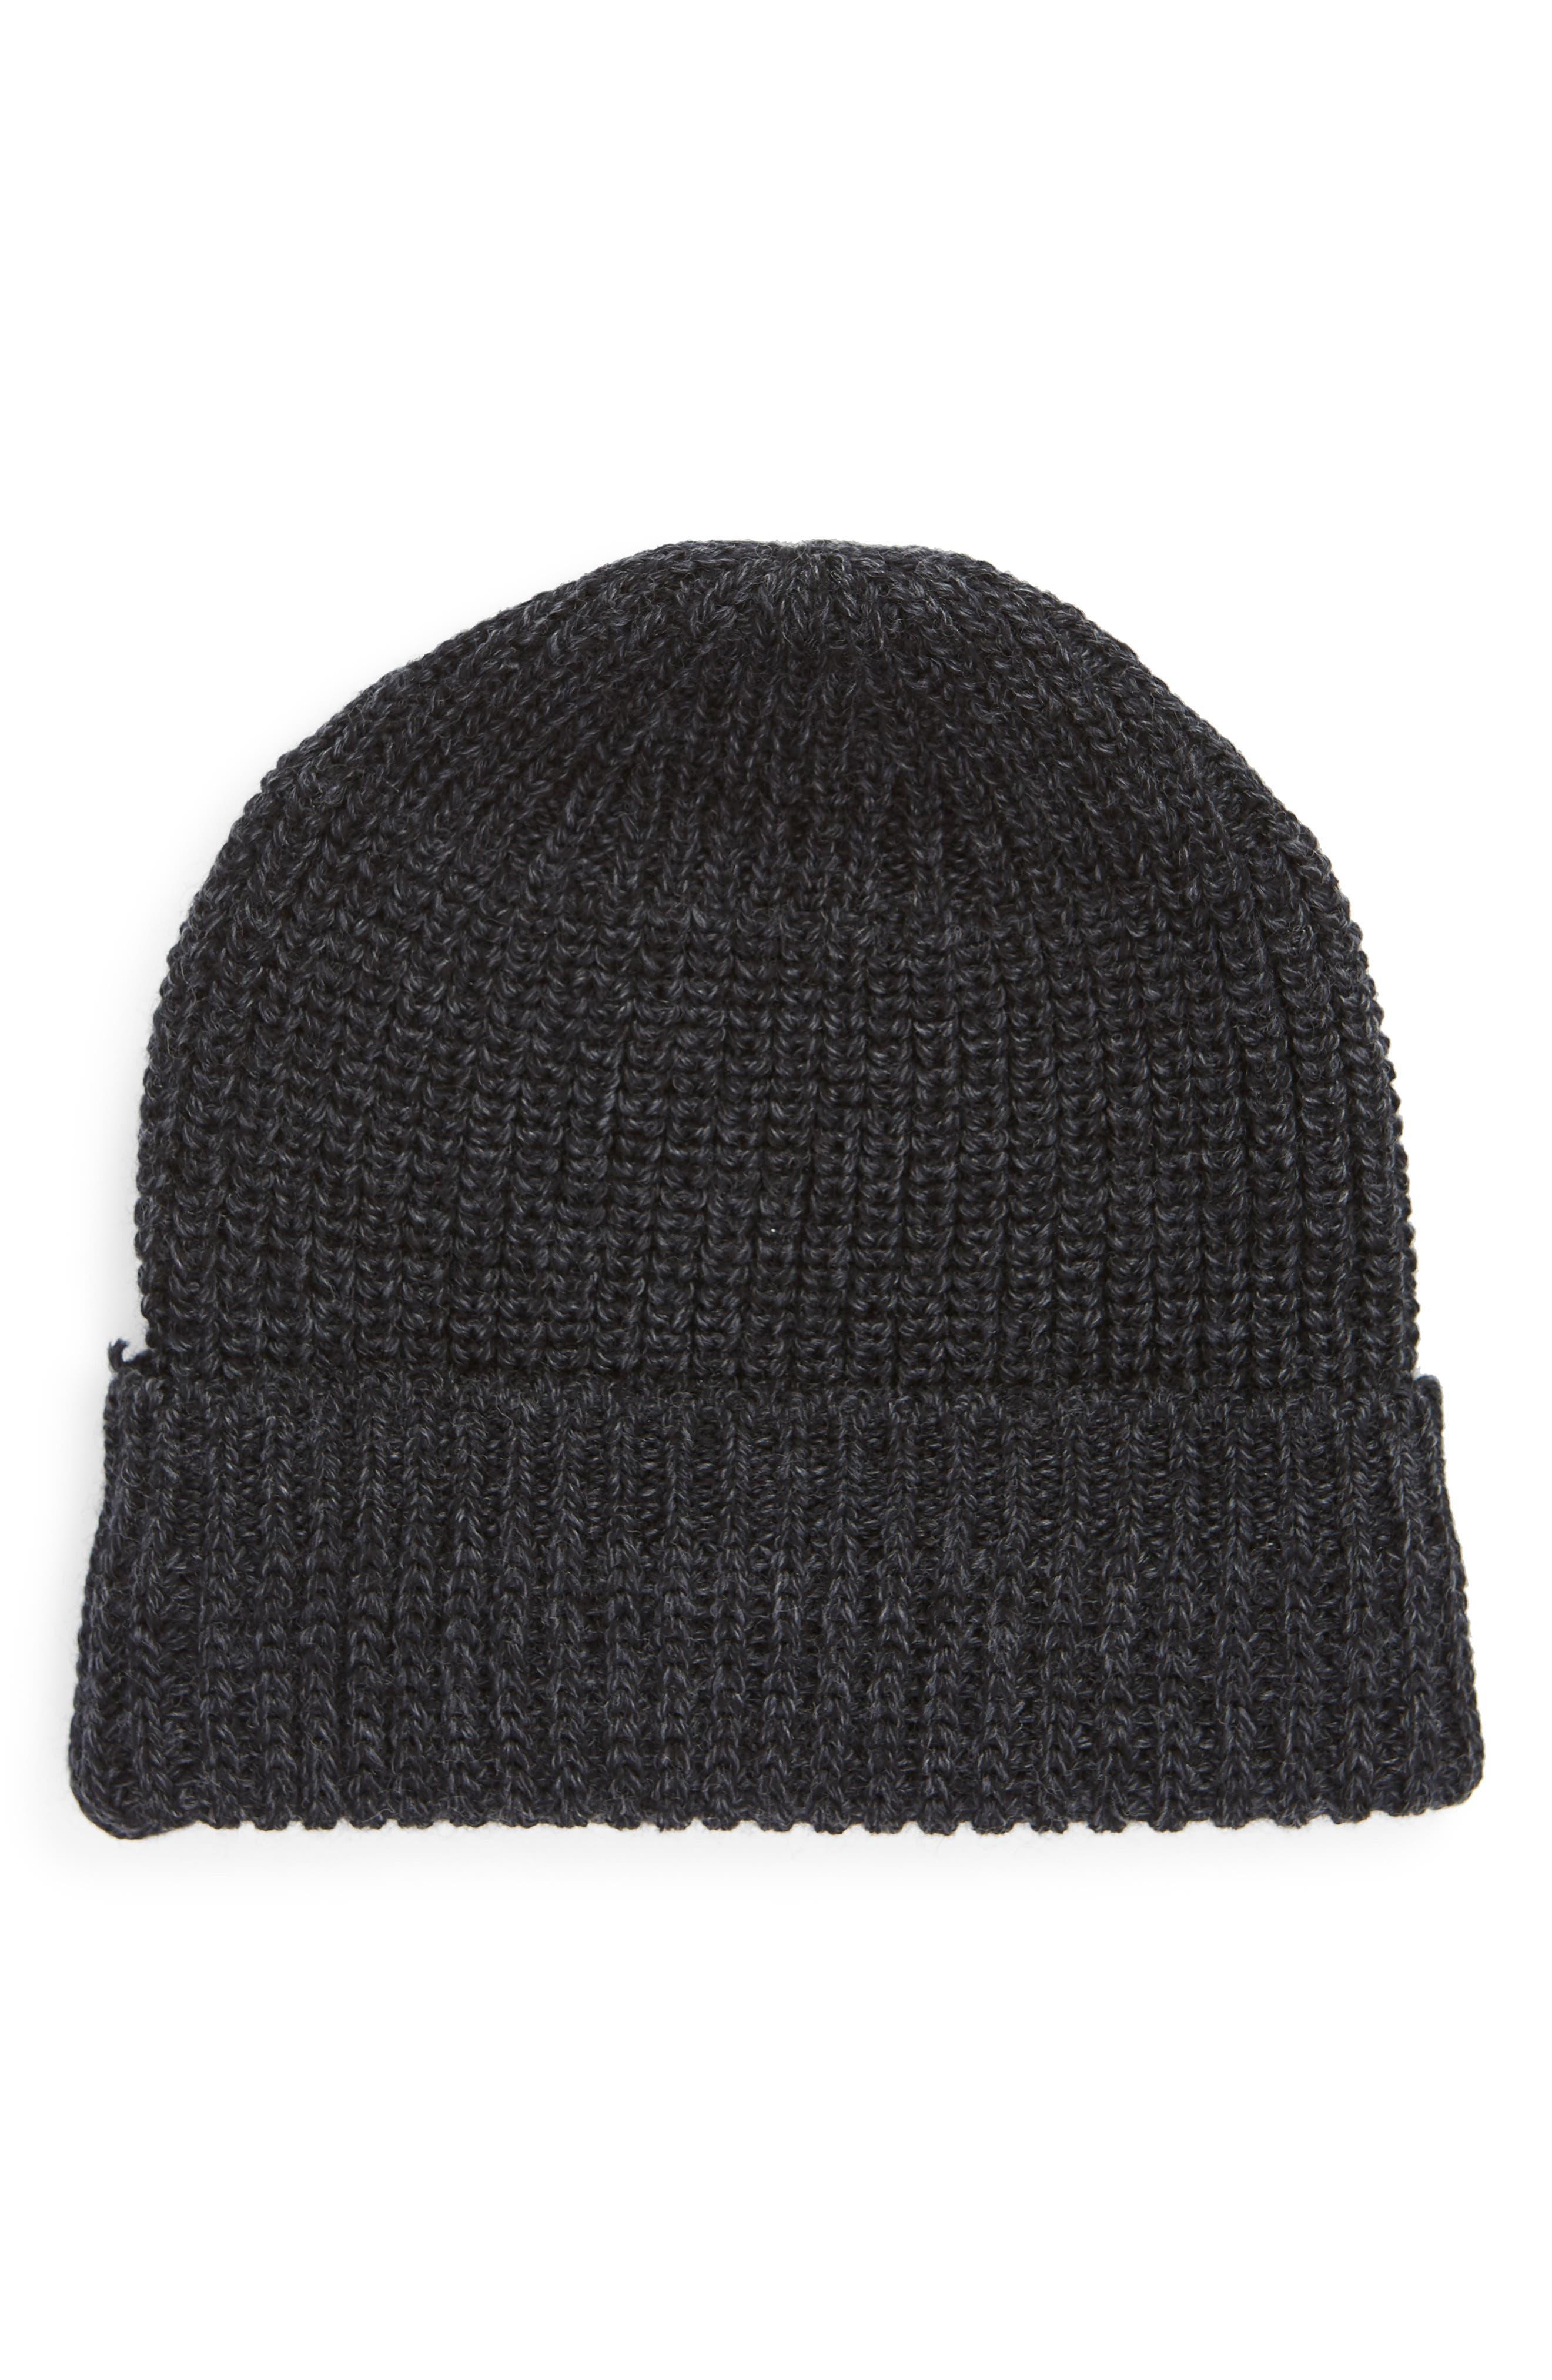 Knit Wool Beanie,                             Main thumbnail 1, color,                             CHARCOAL